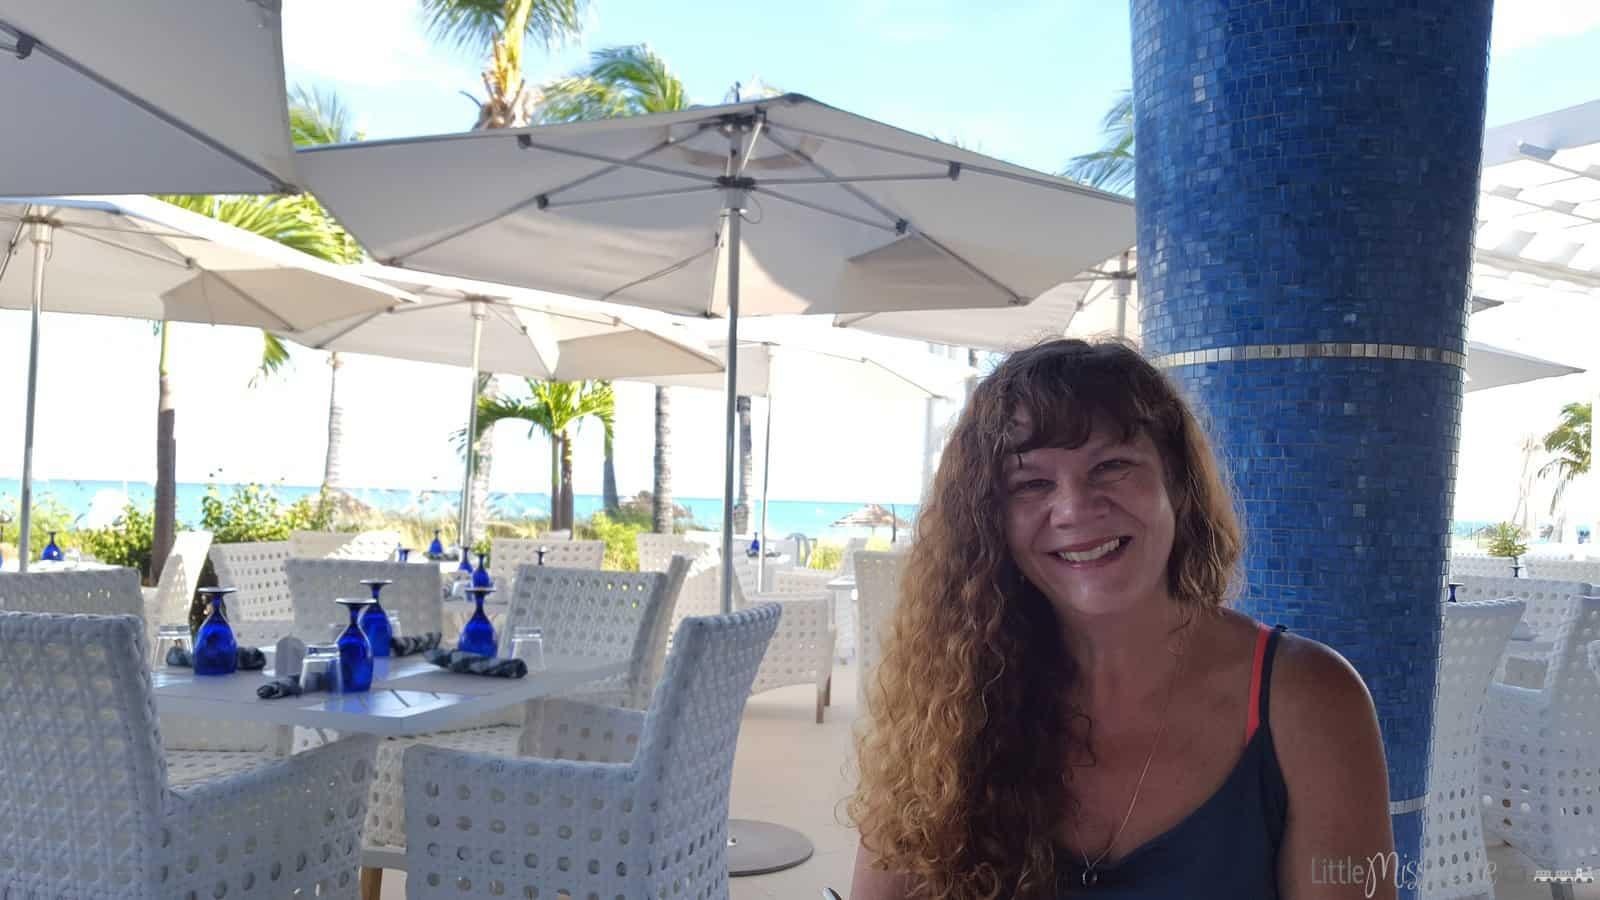 Beaches Resort Villages Turks and Caicos Restaurants - Bayside via littlemisskate.ca